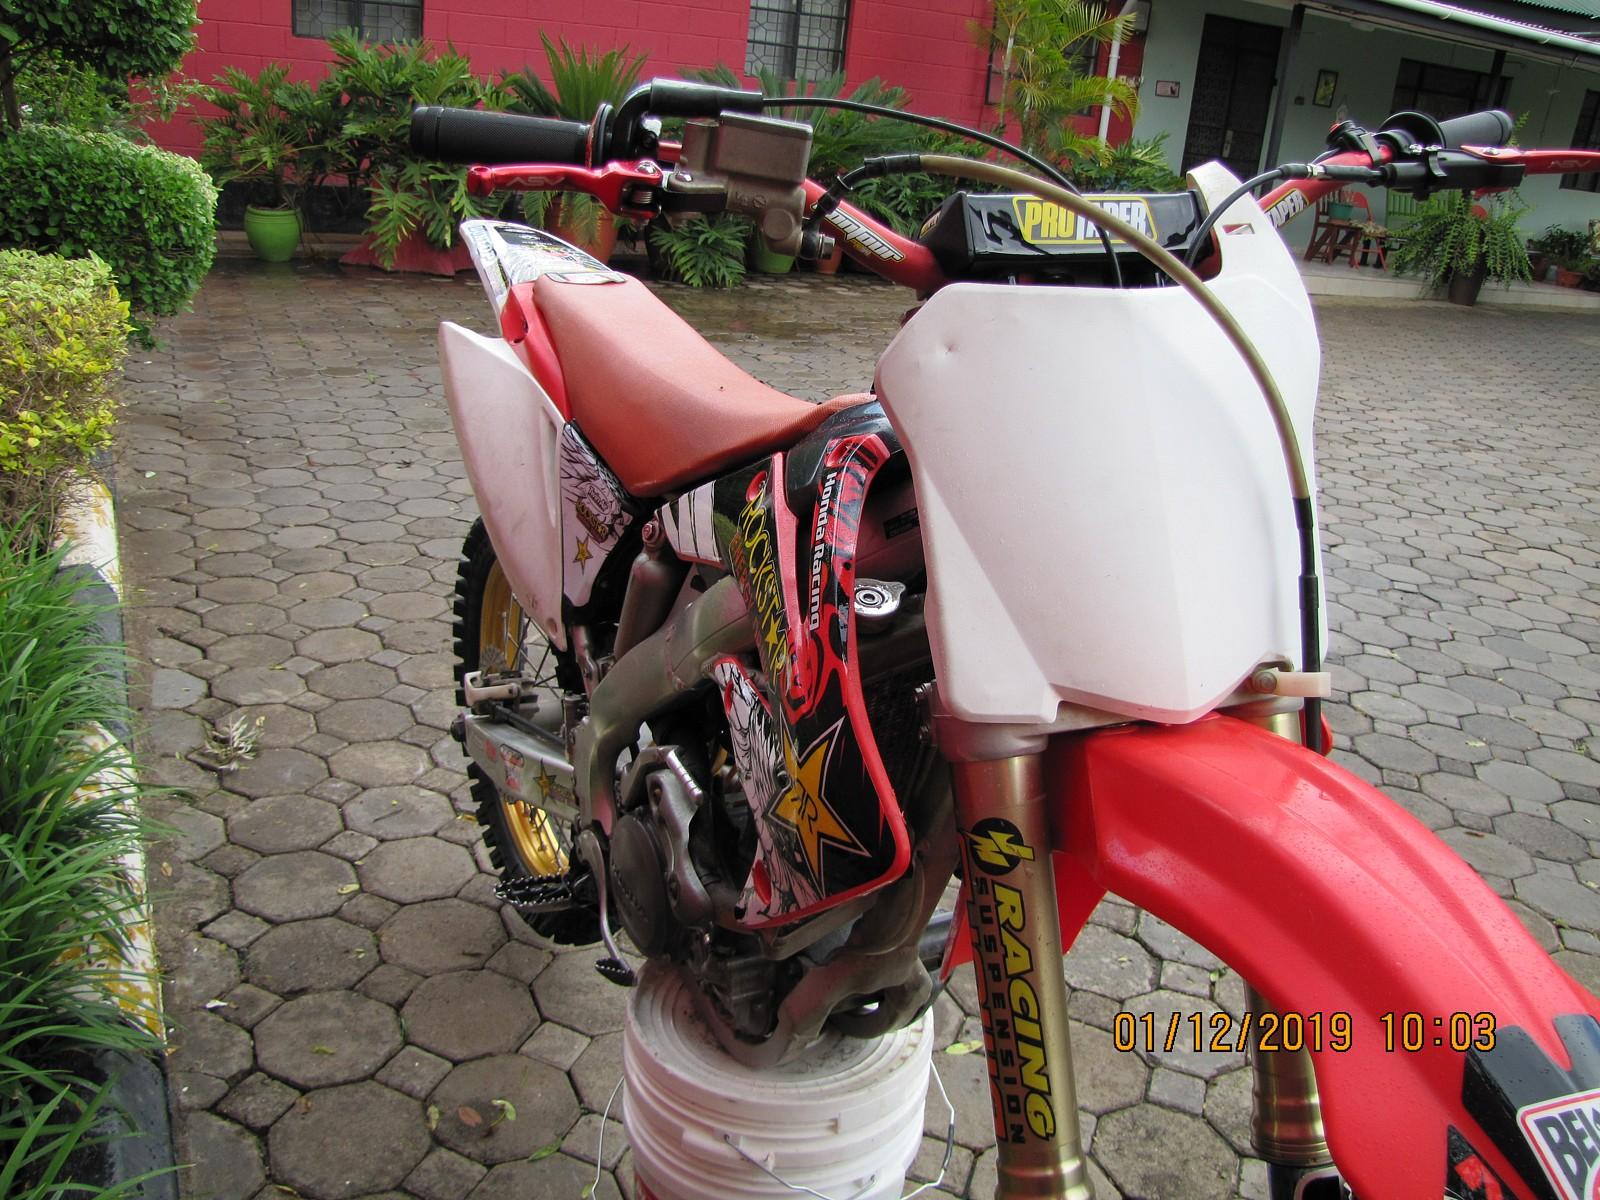 IMG 0021 - banny wailer - Motocross Pictures - Vital MX